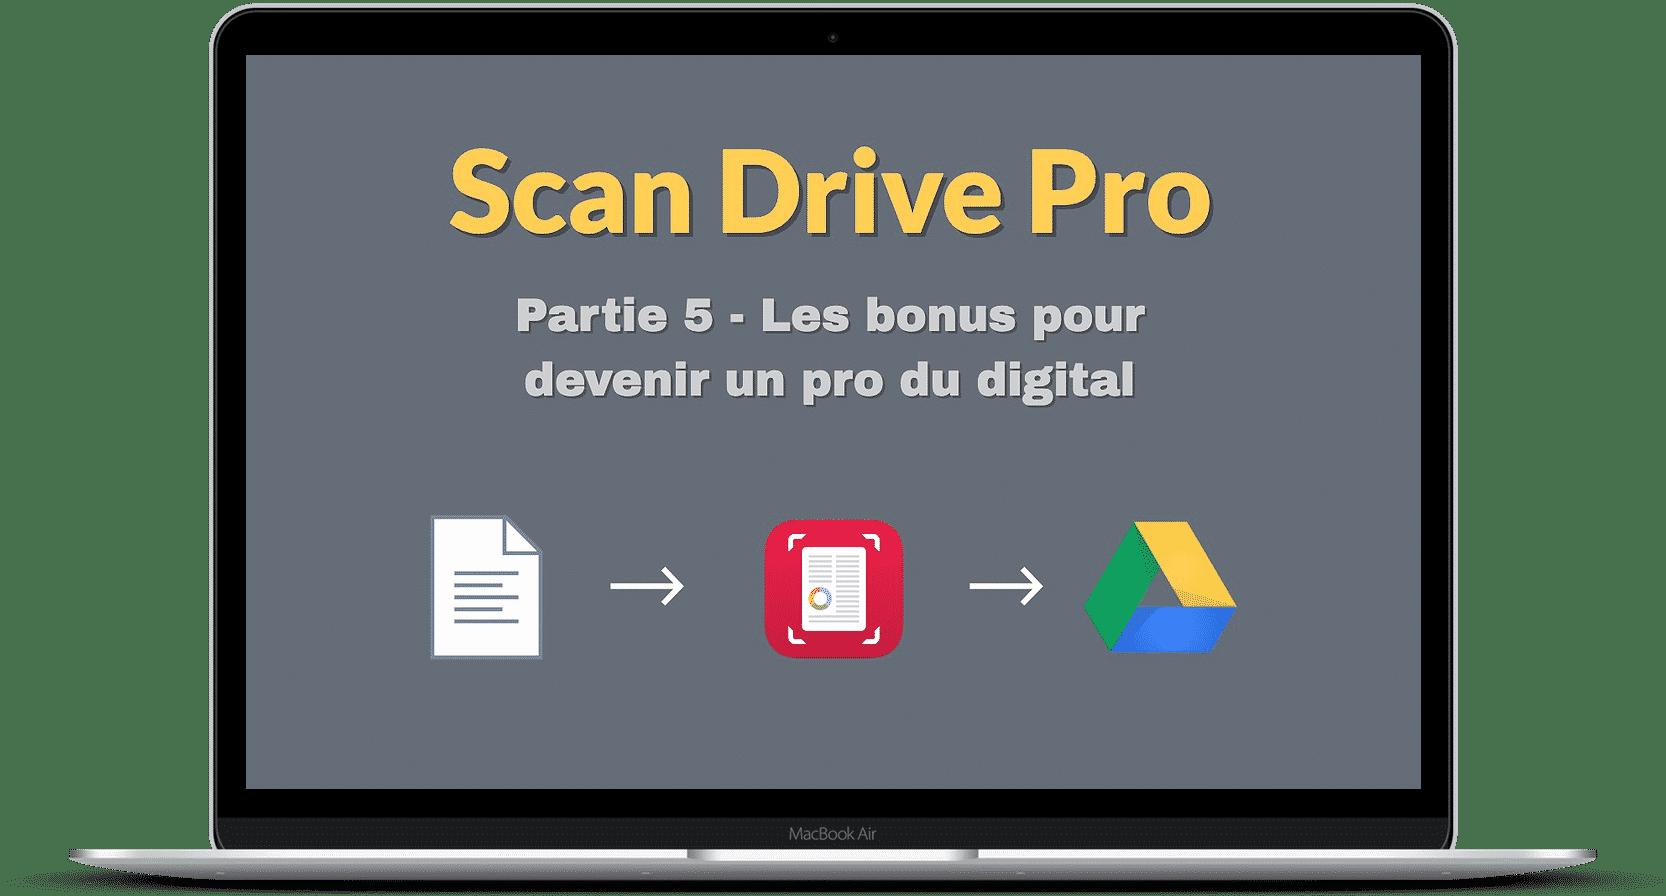 Scan Drive Pro 5